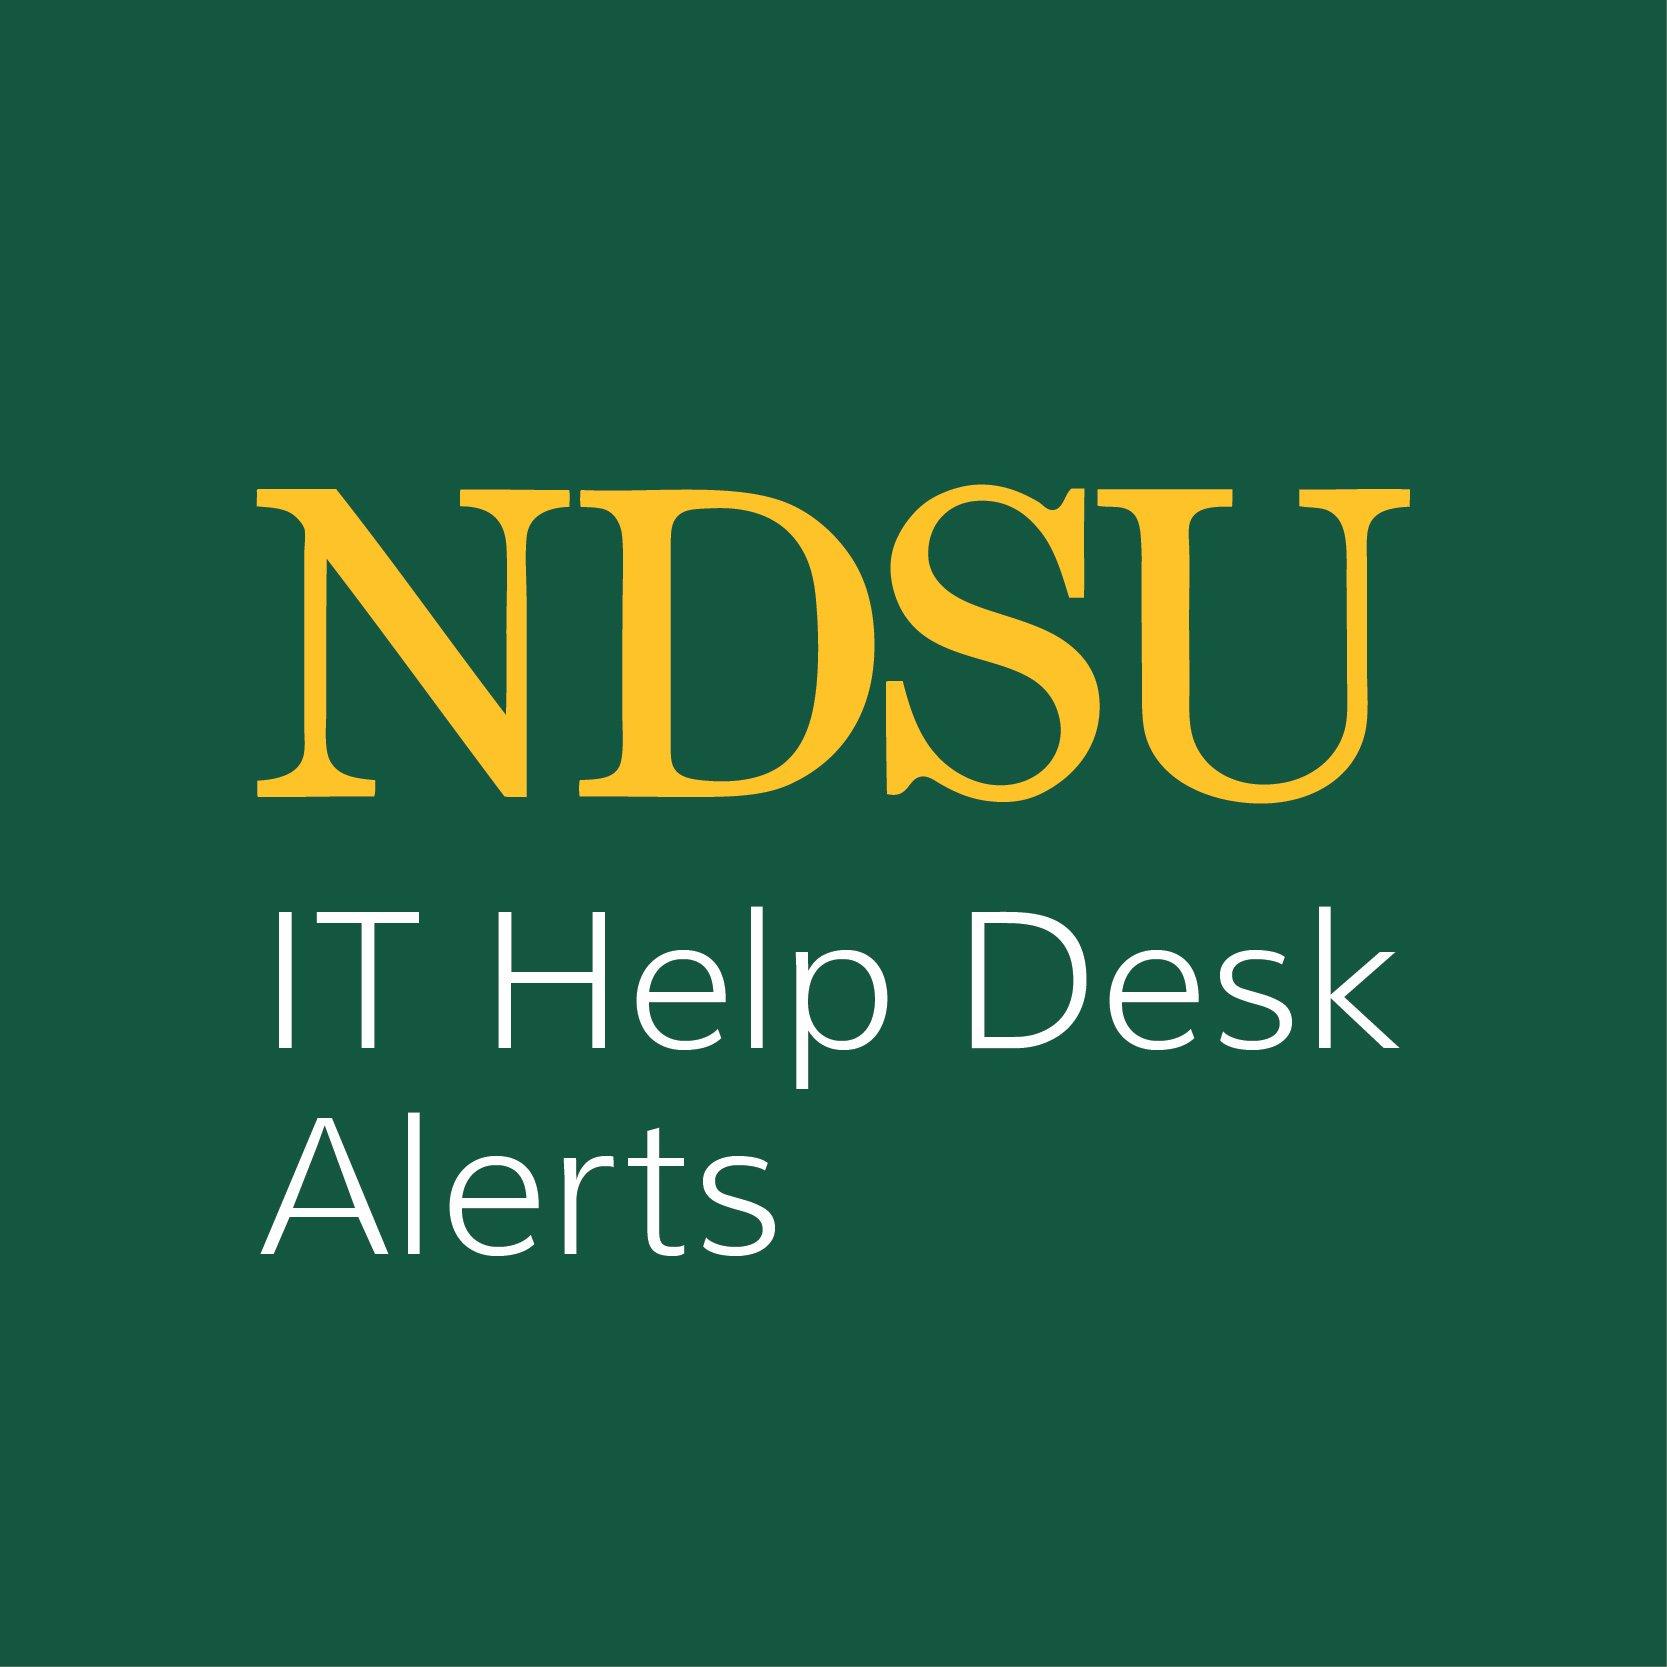 NDSU Help Desk Alert